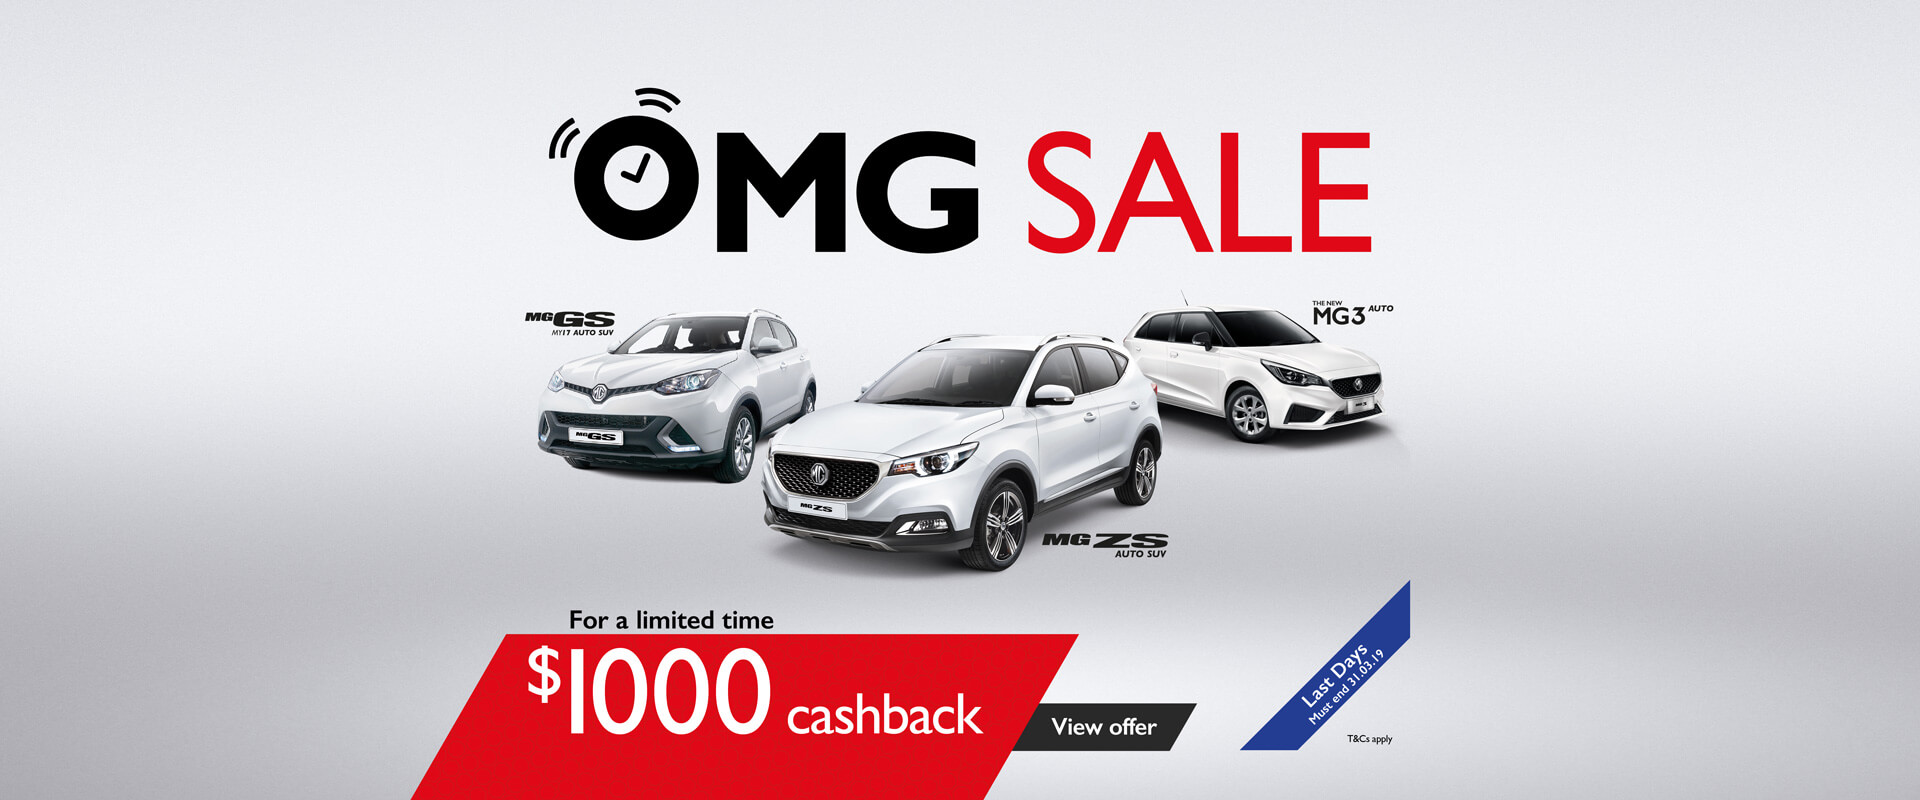 MG - OMG Sale Last Days!